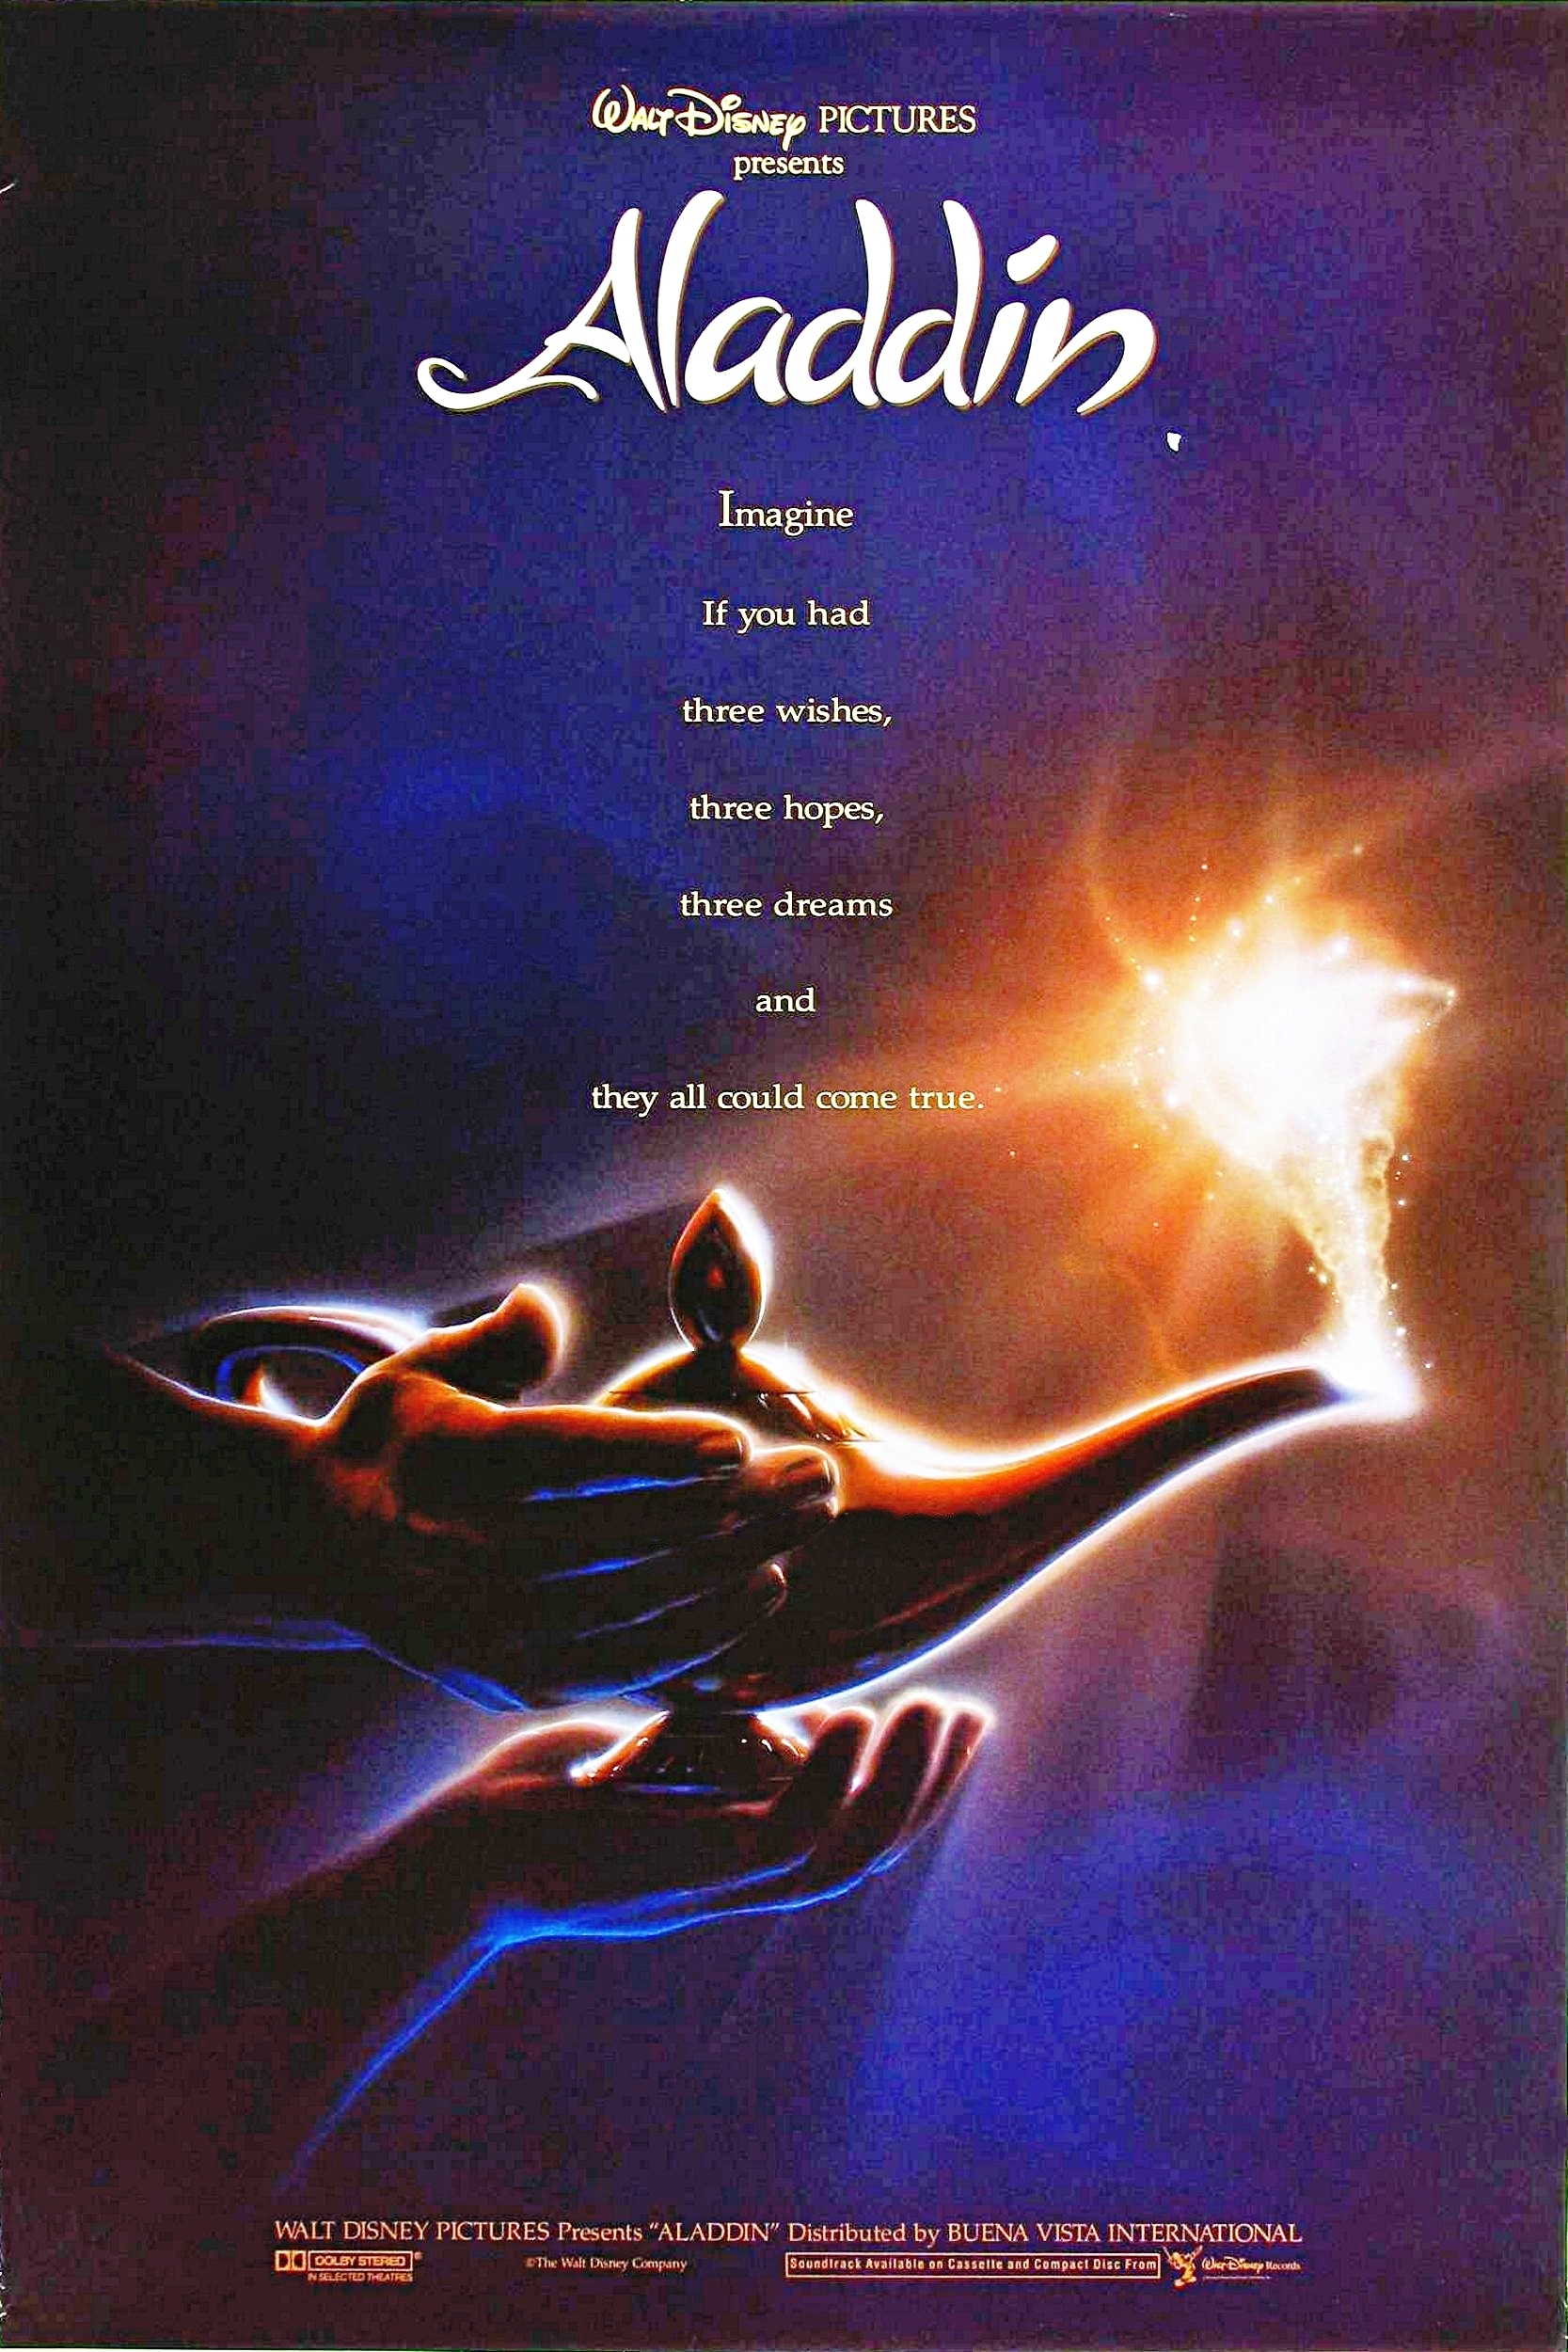 Aladdin_poster.jpg